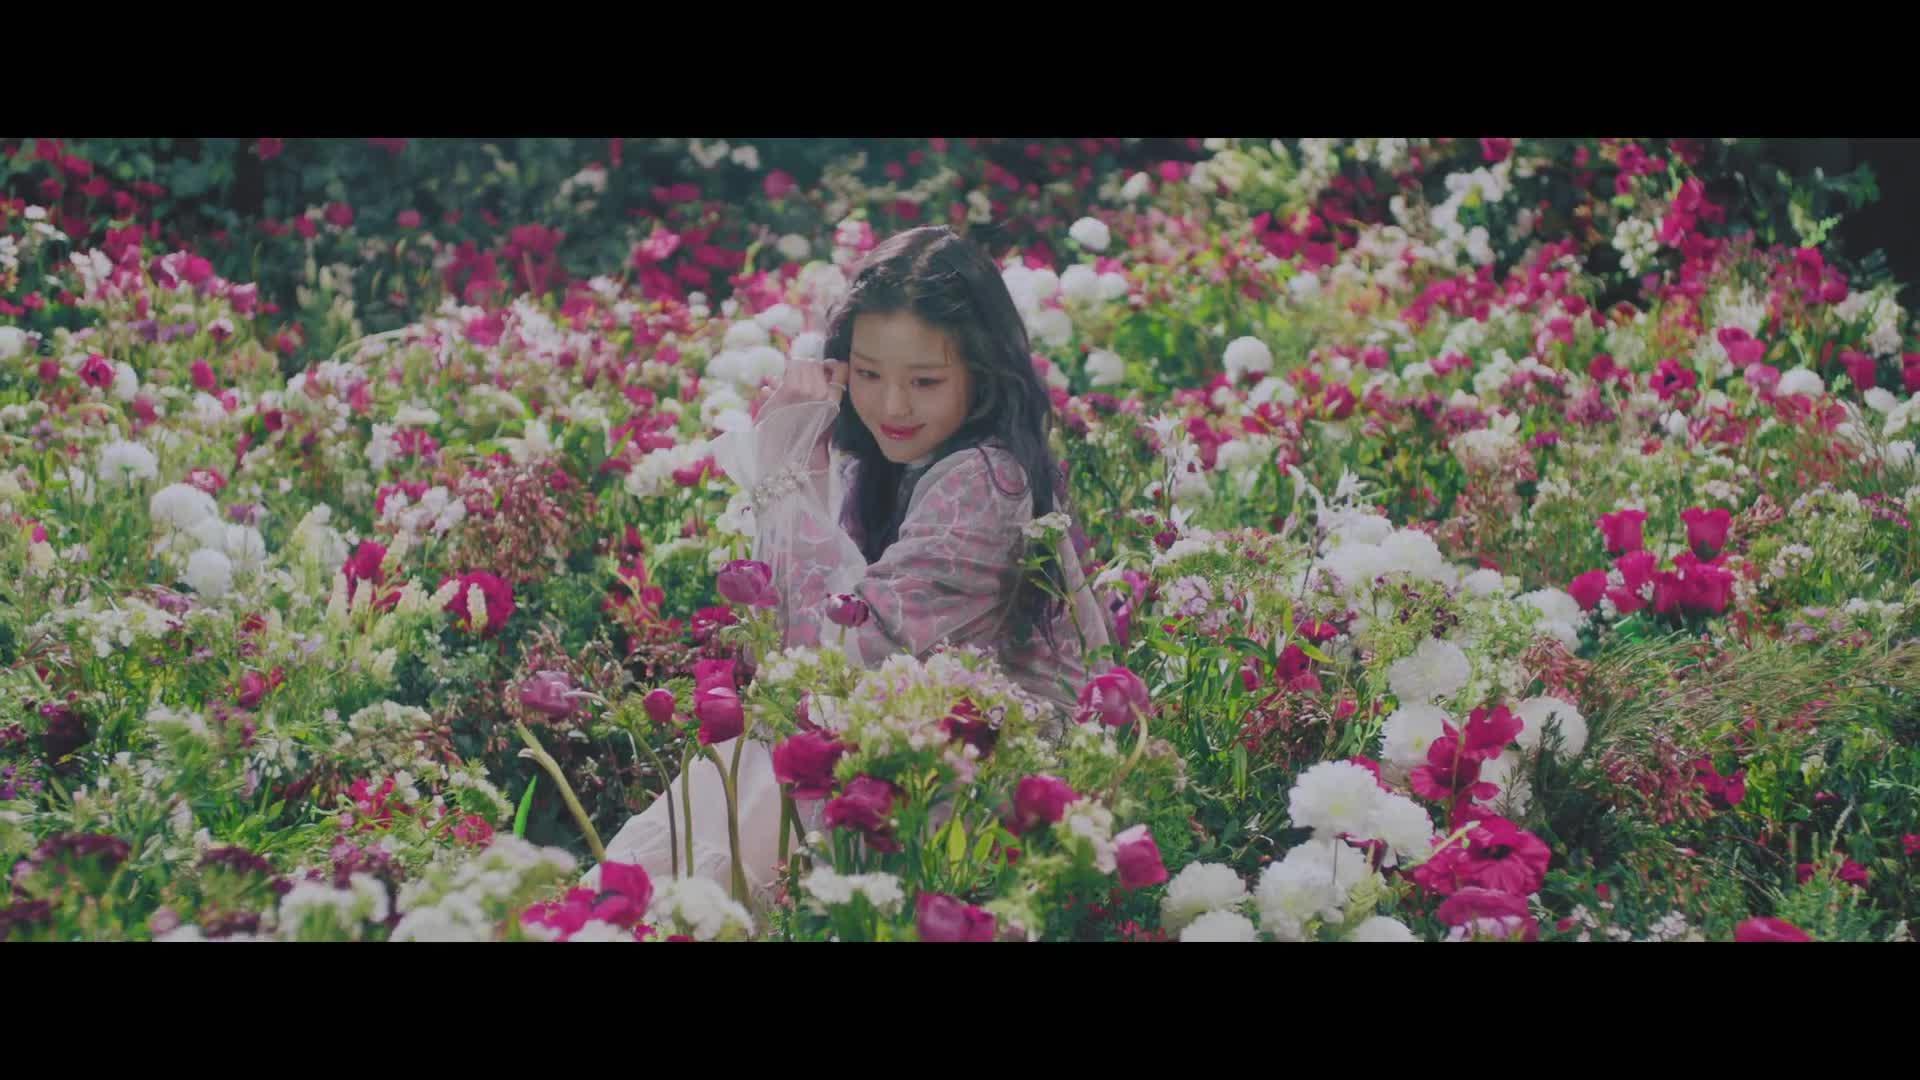 IZ*ONE, IZ*ONE MV, IZONE, Jang Wonyoung, K-CULTURE korean Music MV Music Video K-Pop Kpop 뮤비 뮤직비디오, Stone Music Entertainment, Violeta, Wonyoung, 비올레타, 비올레타 뮤비, 아이즈원, 아이즈원 뮤비, Jang Wonyoung - IZONE